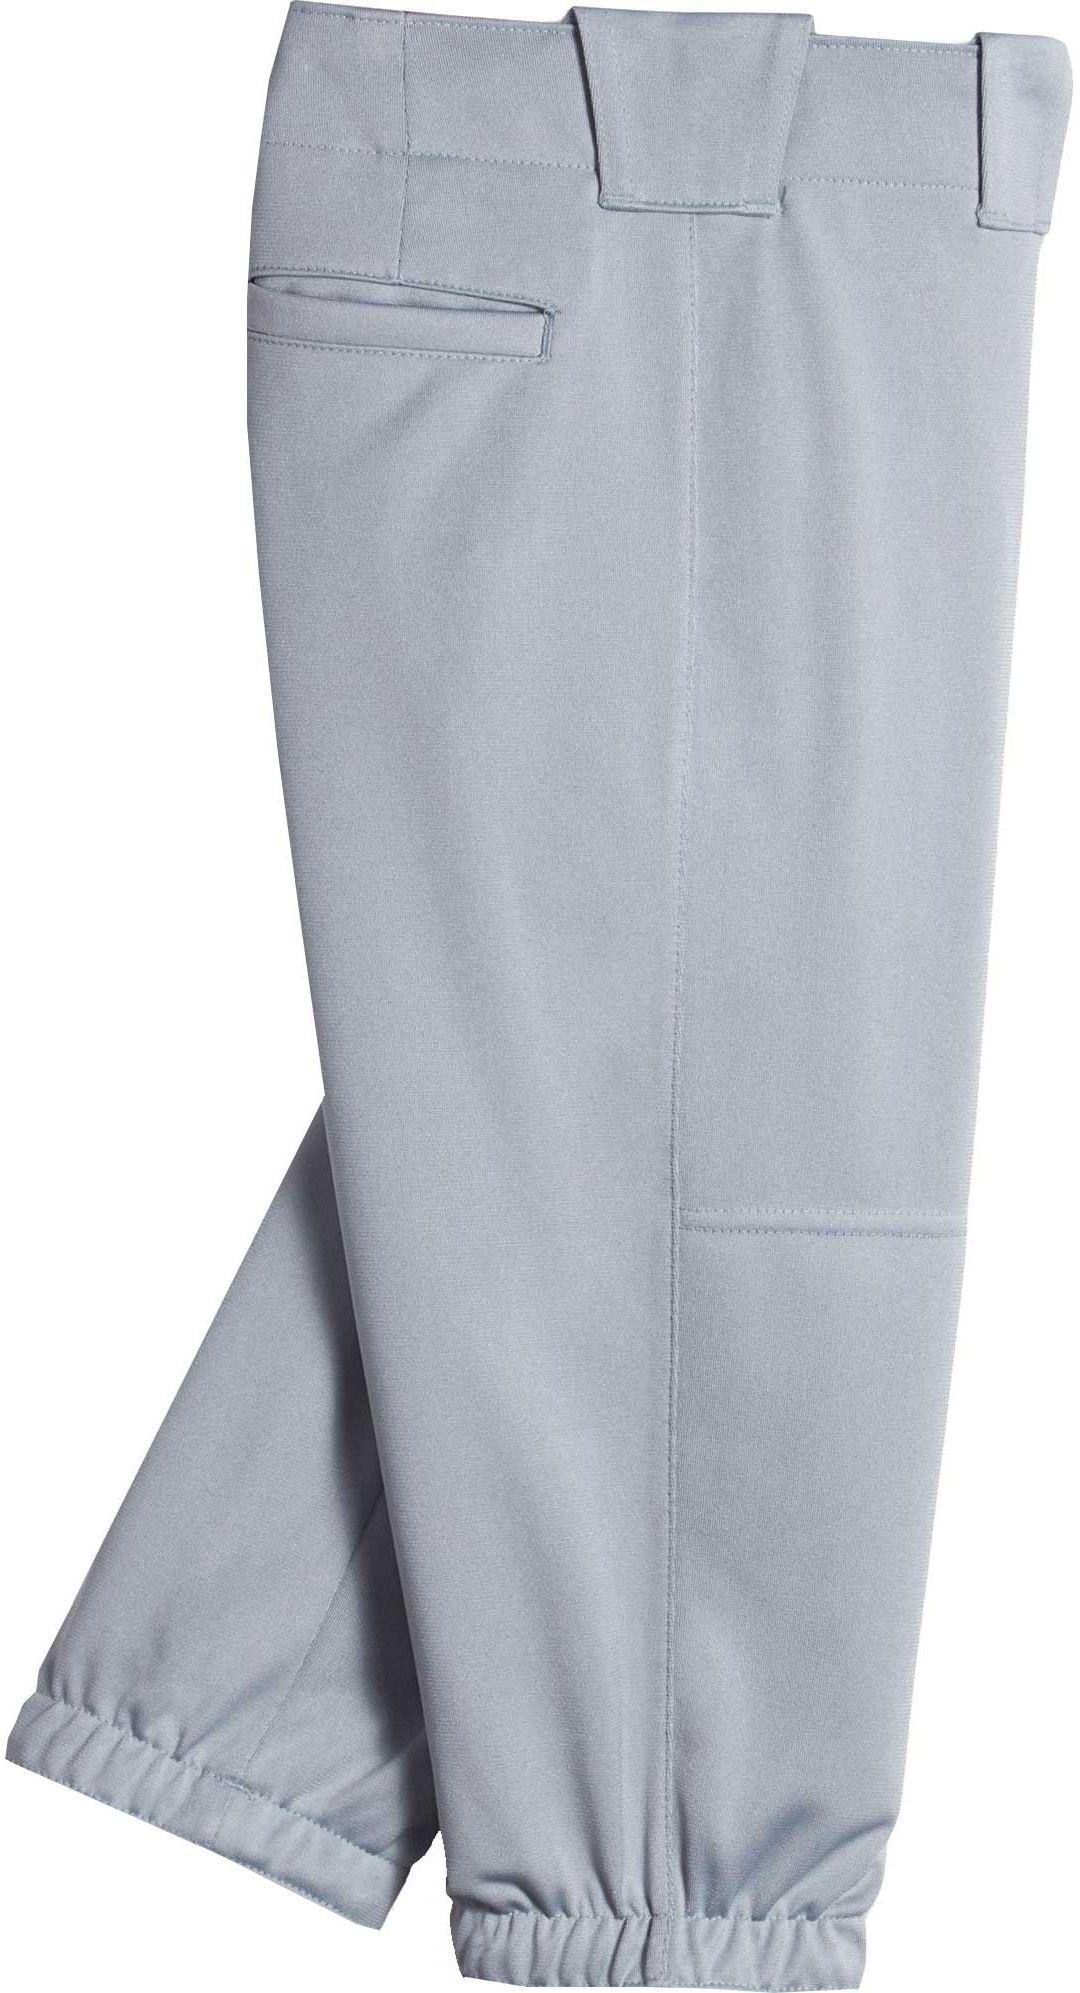 859ddb5497711c Nike Girls' Diamond Invader ¾ Length Fastpitch Pants   DICK'S ...